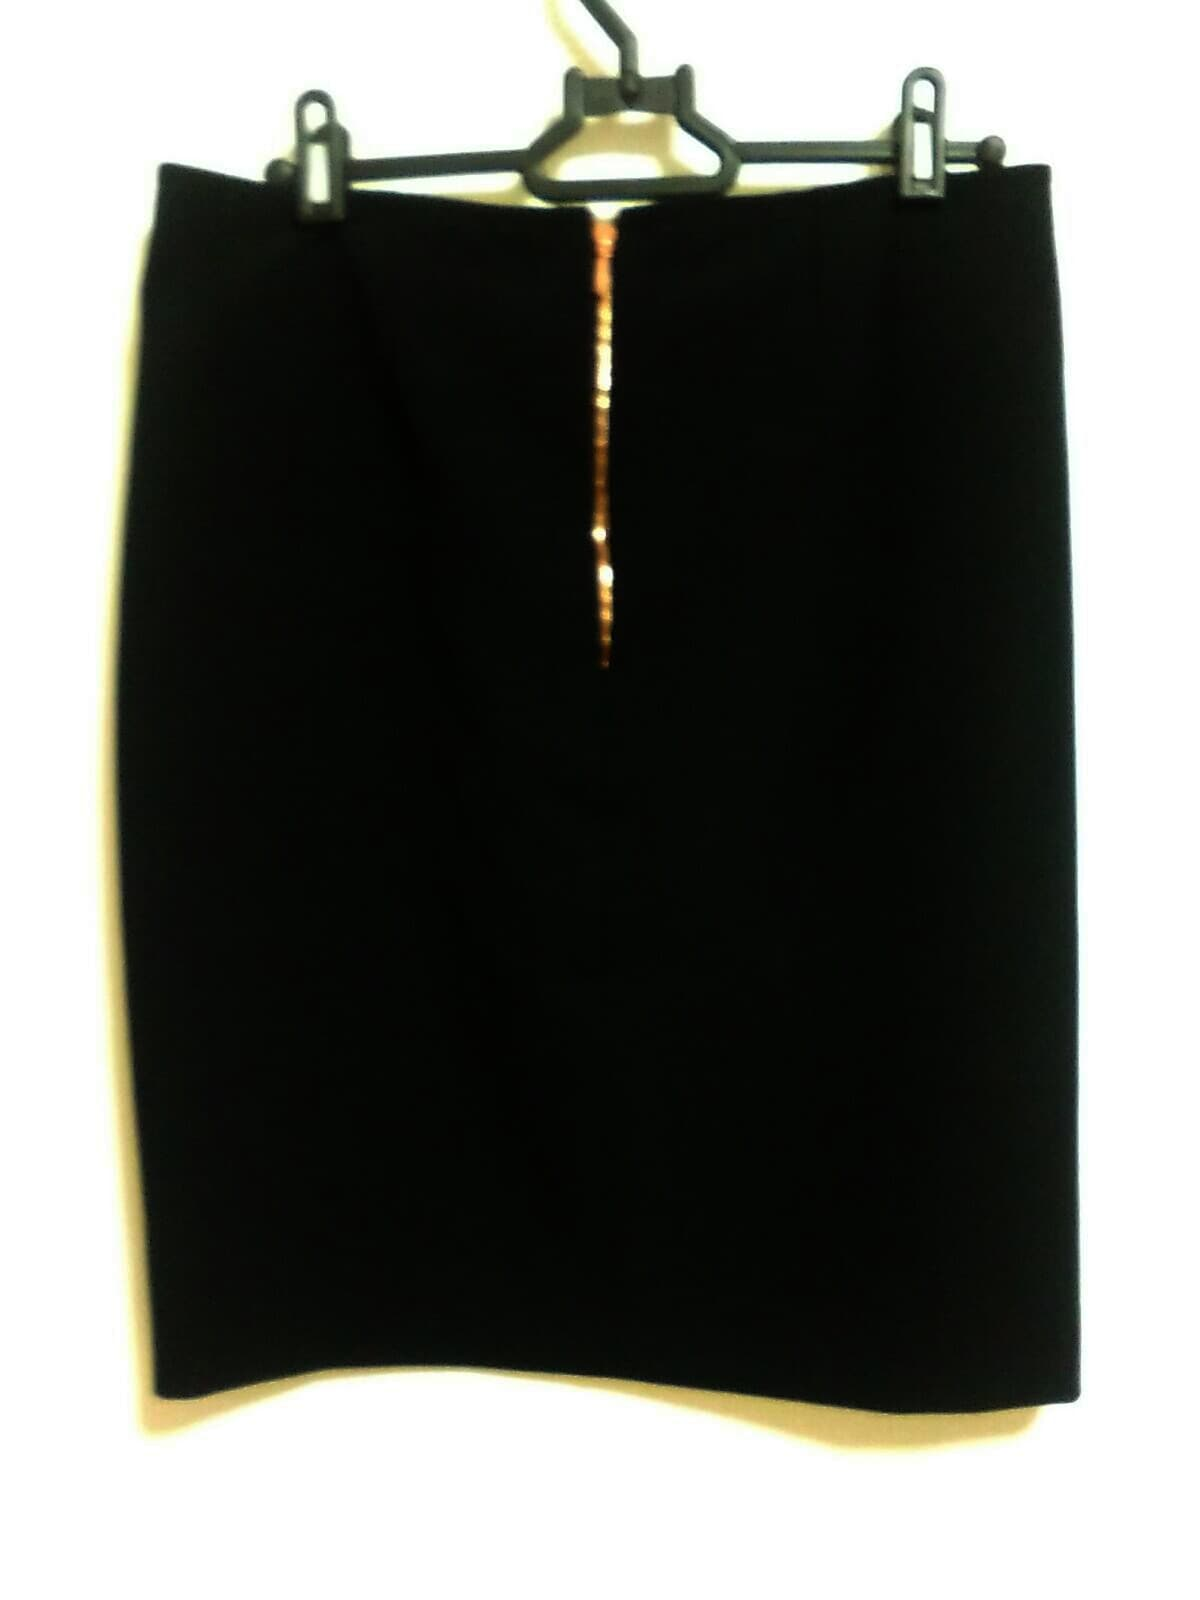 CEDRICCHARLIER(セドリック シャルリエ)のスカート